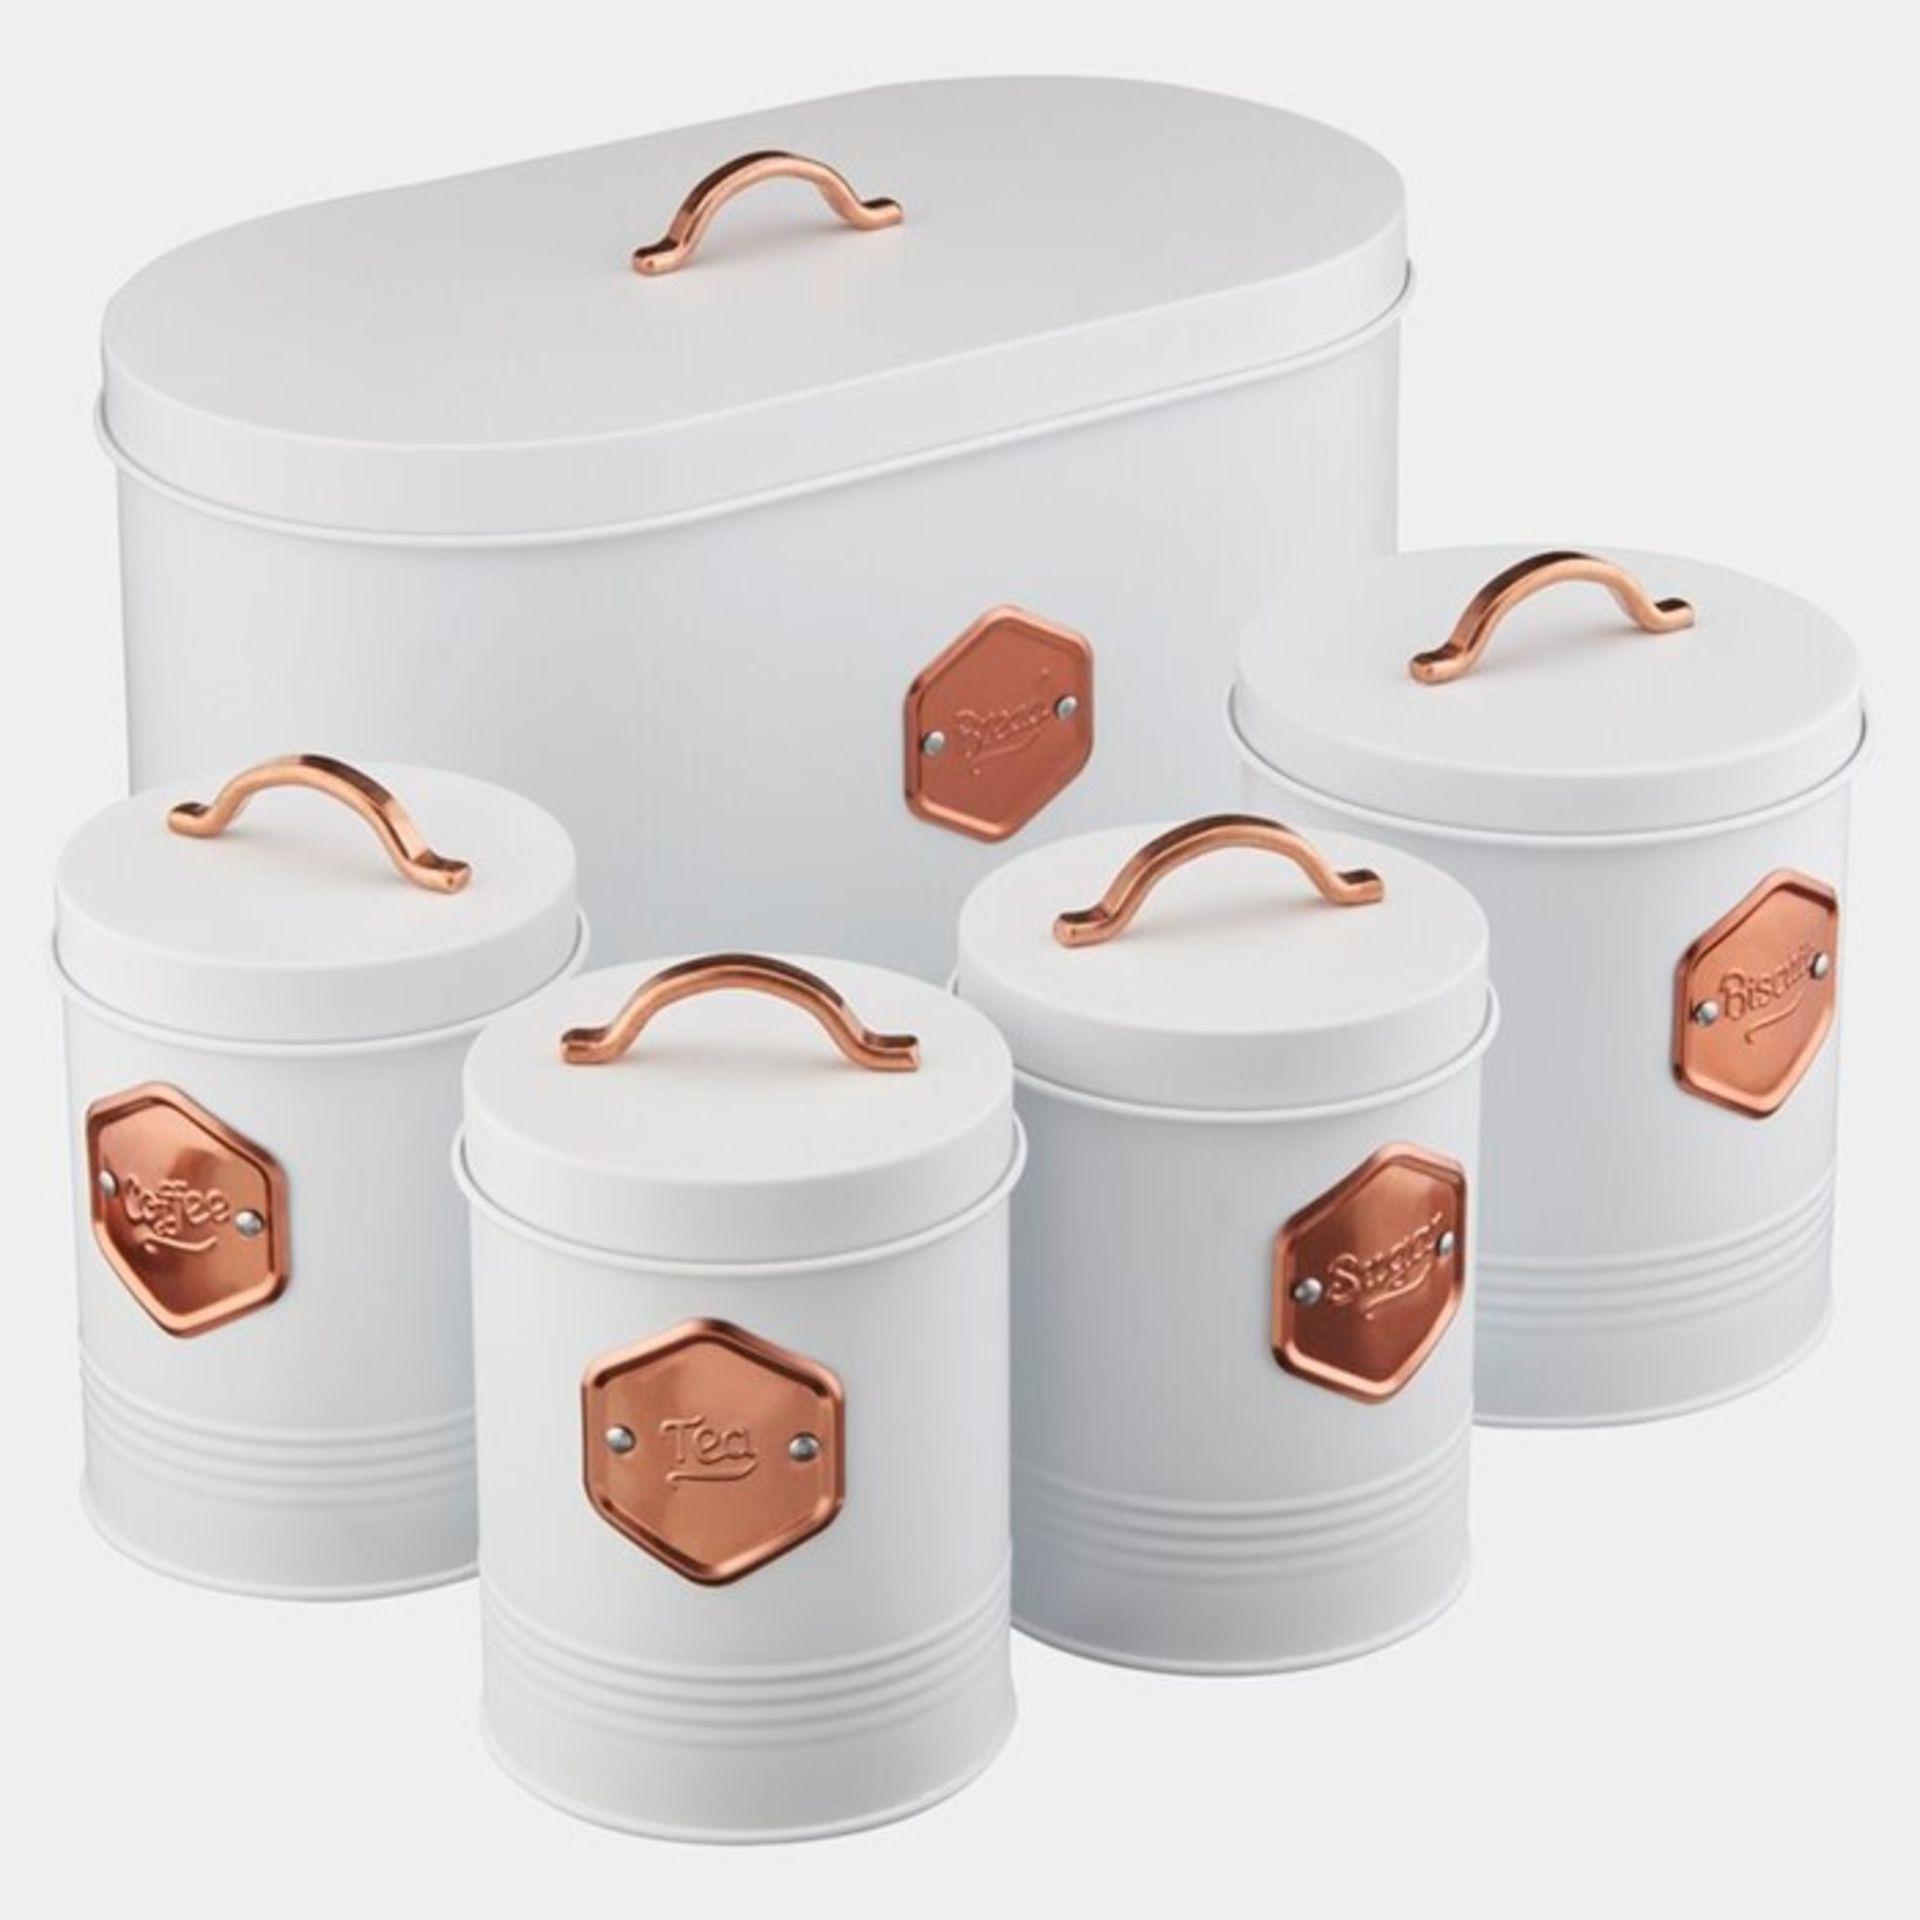 Cooks Professional, 5 Container Food Storage Set (BLACK & COPPER) - RRP£39.99 (EWEB1075 - 21458/